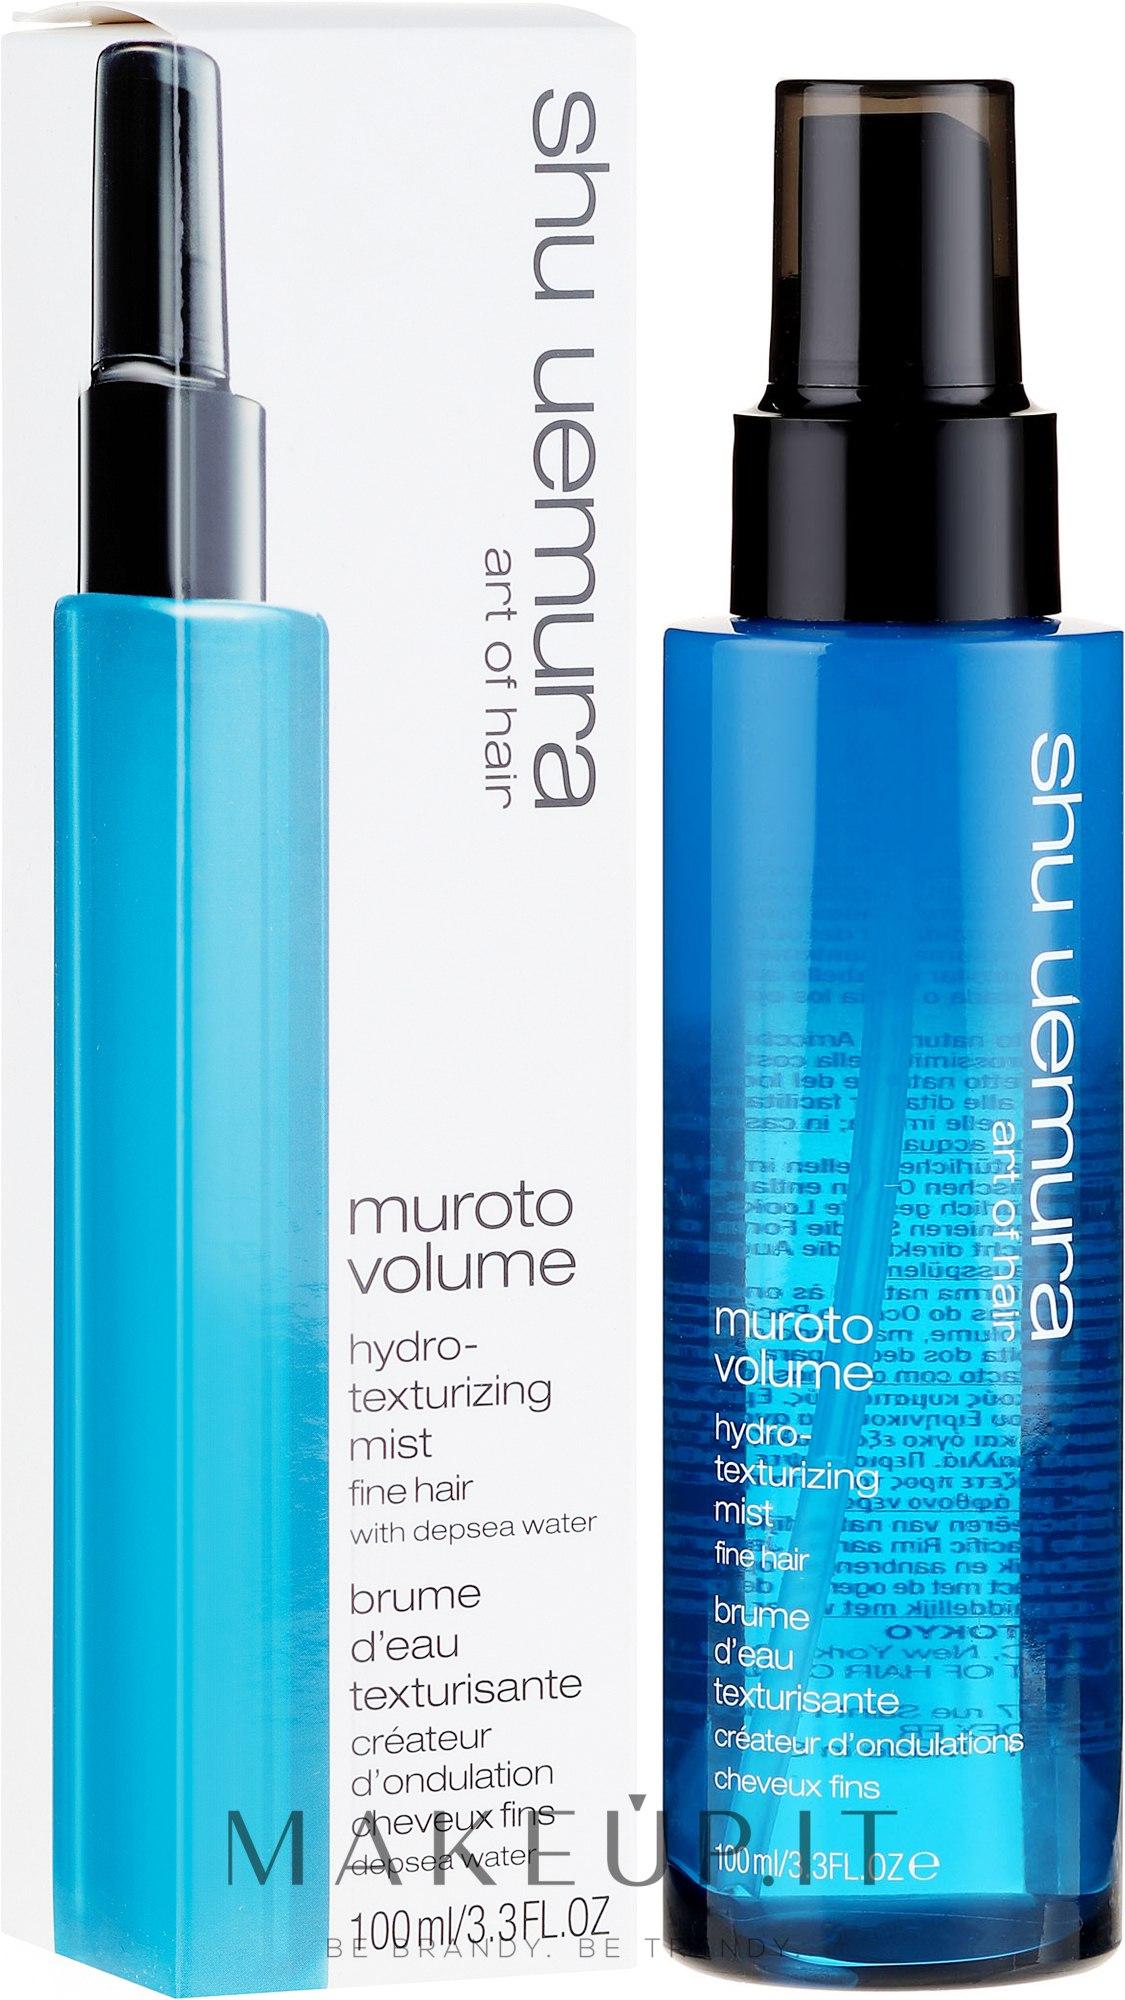 Emulsione modellante idratante - Shu Uemura Art of Hair Muroto Volume Hydro Texturising Mist — foto 100 ml